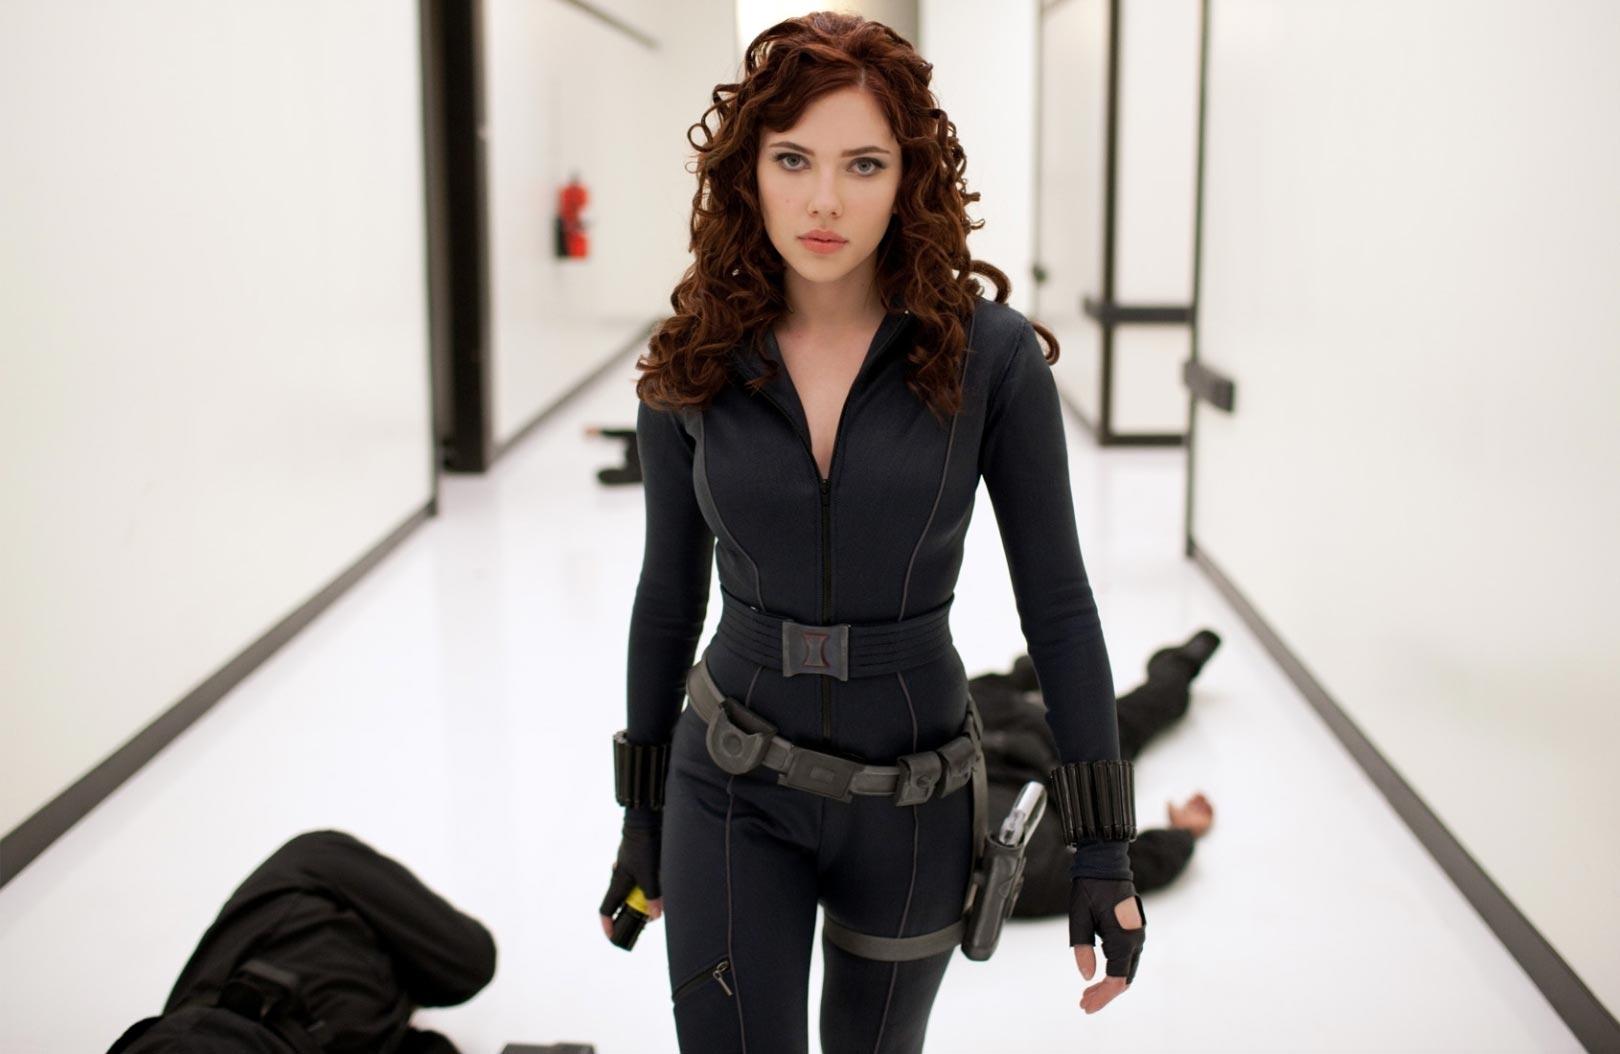 Scarlett Johansson As Natasha Romanoff Black Widow Gif